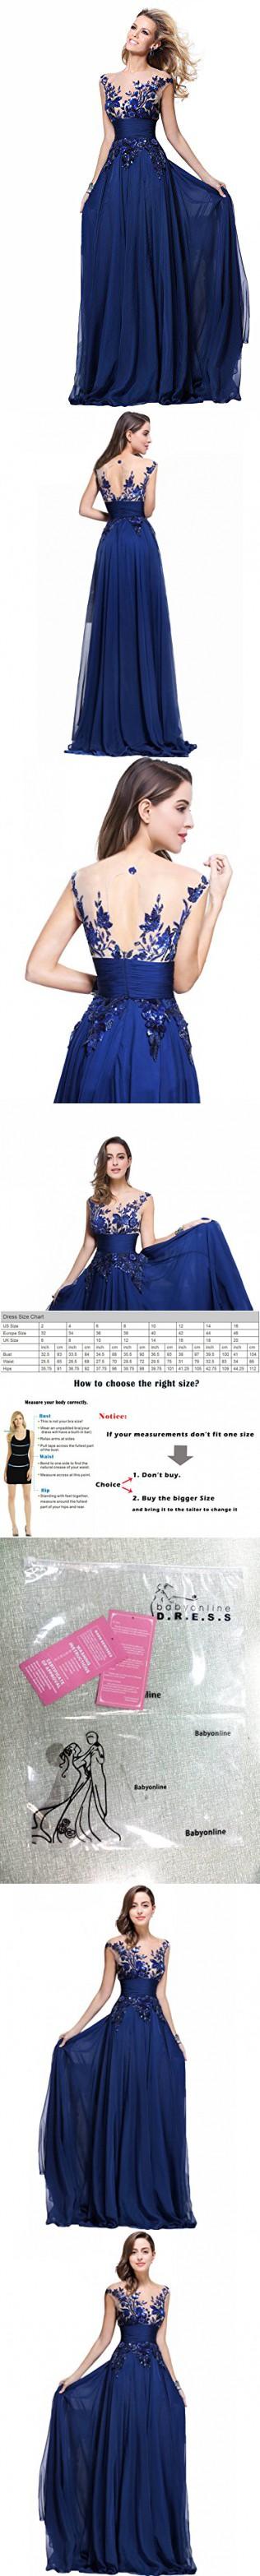 Babyonline chiffon prom dresses long for women formal cocktail